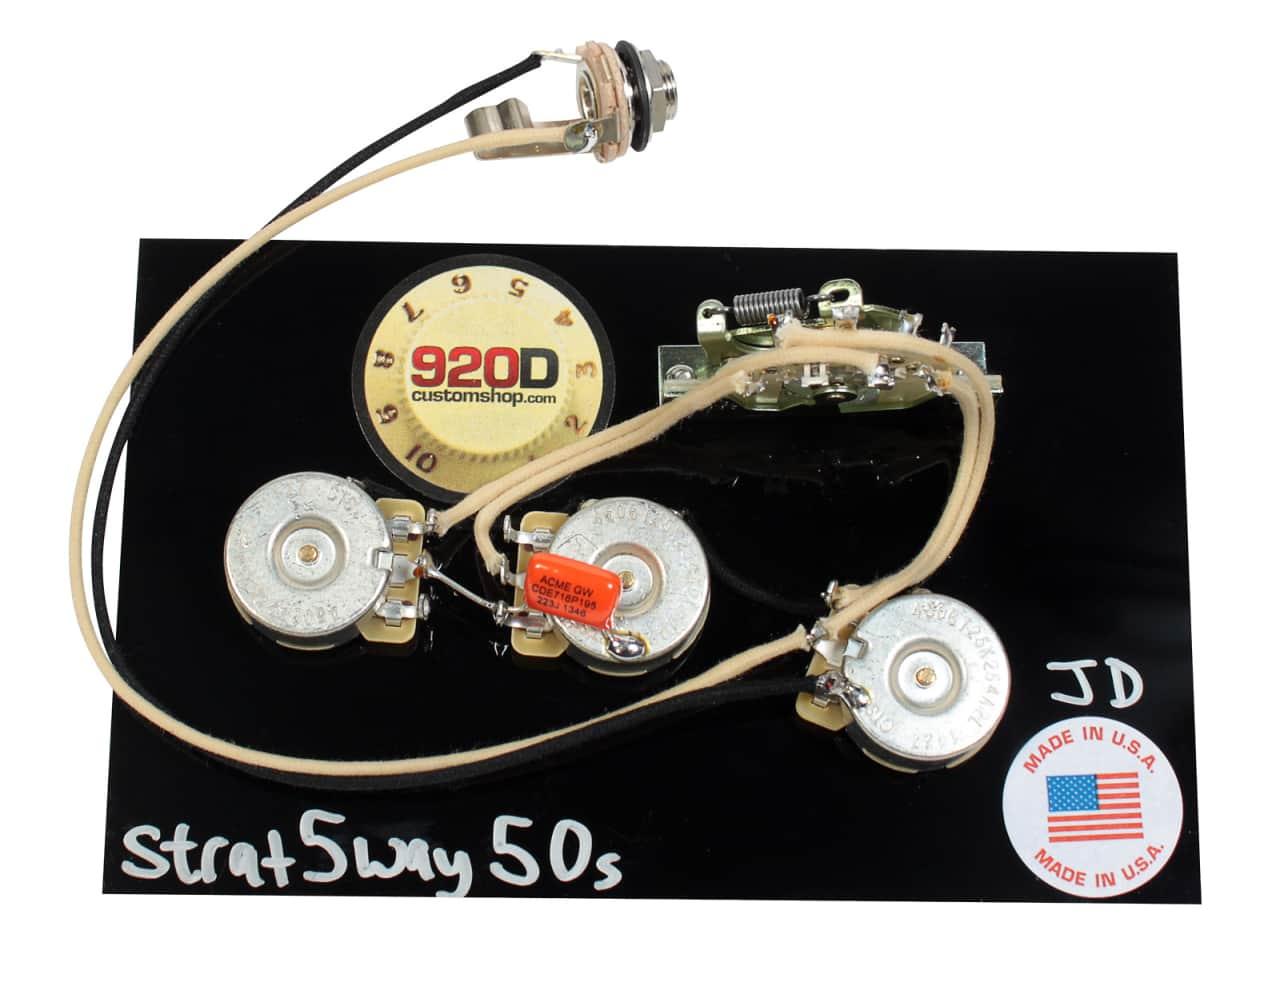 920d custom shop fender strat 5